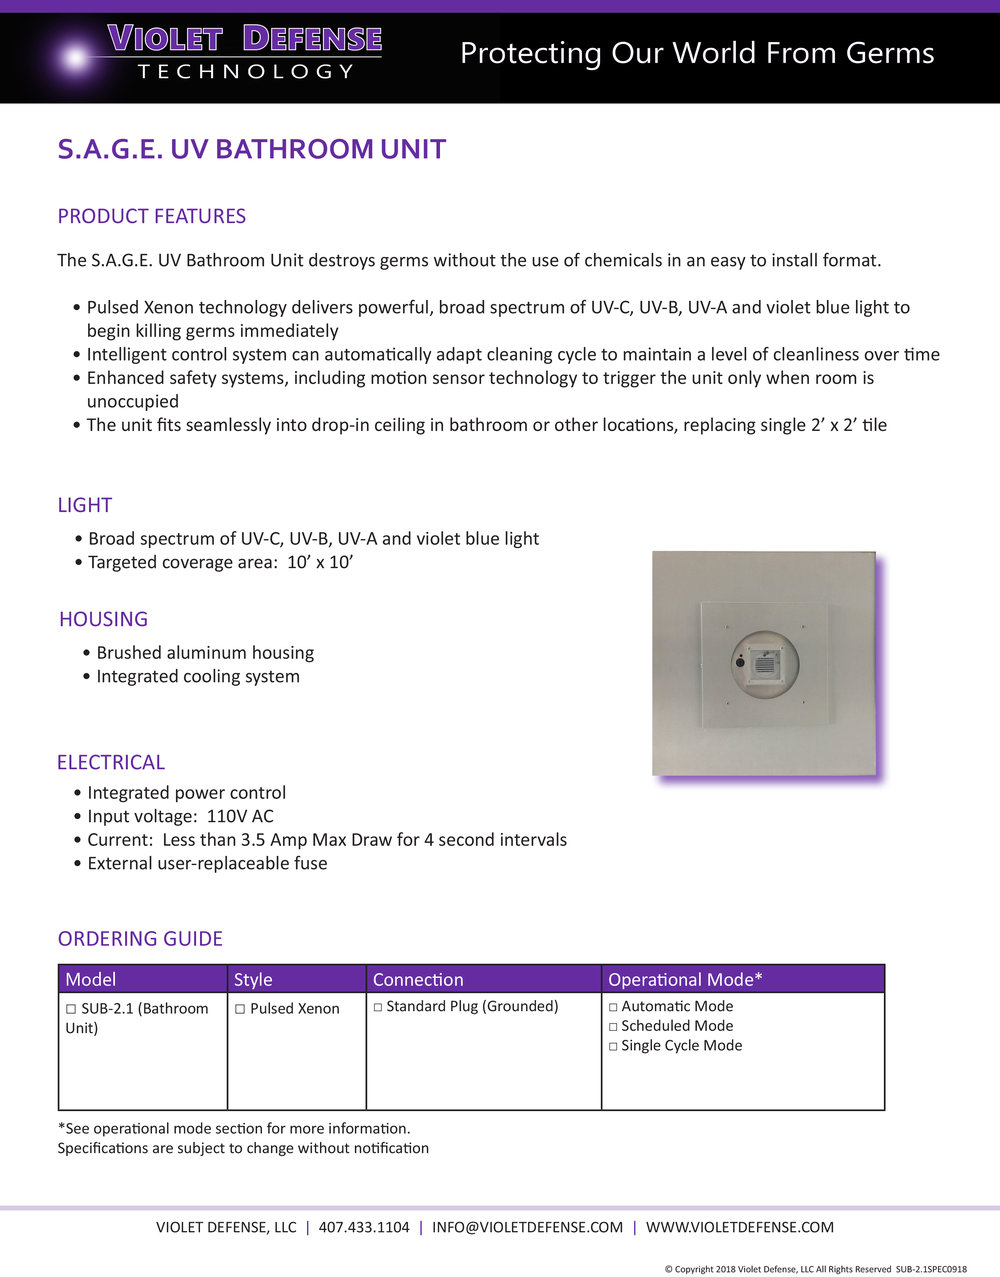 Violet Defense - SAGE UV Gen 2 Bath Unit Specs-1.jpg